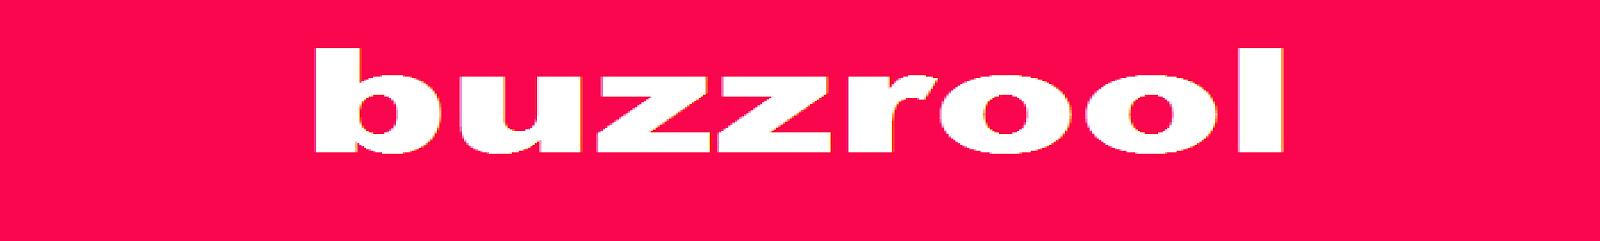 buzzrool